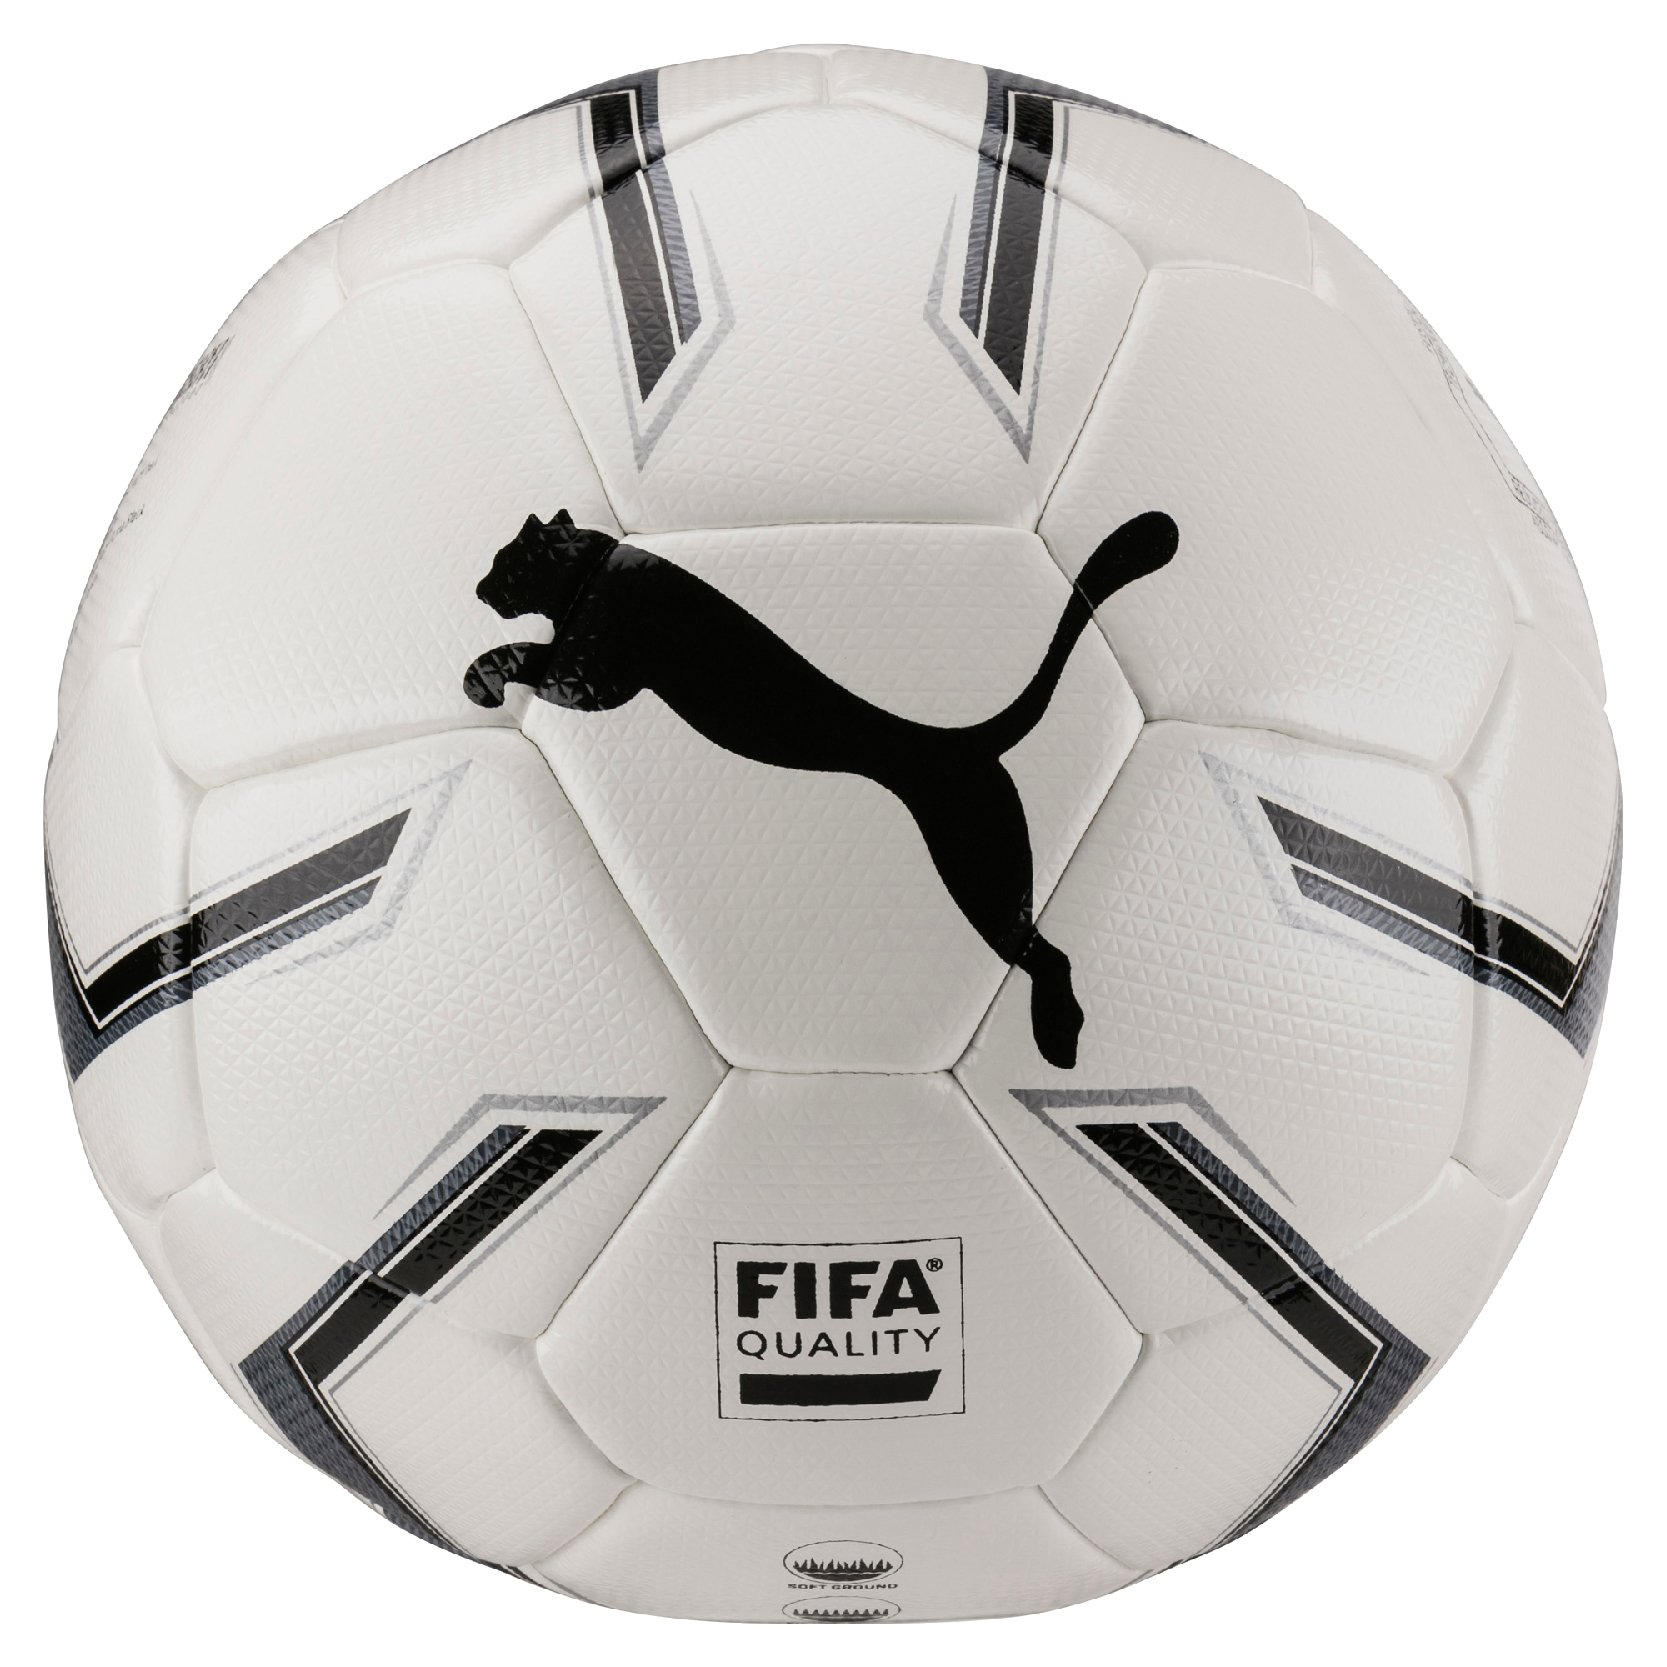 Míč Puma ELITE 2.2 FUSION size 4 (Fifa Quality) b